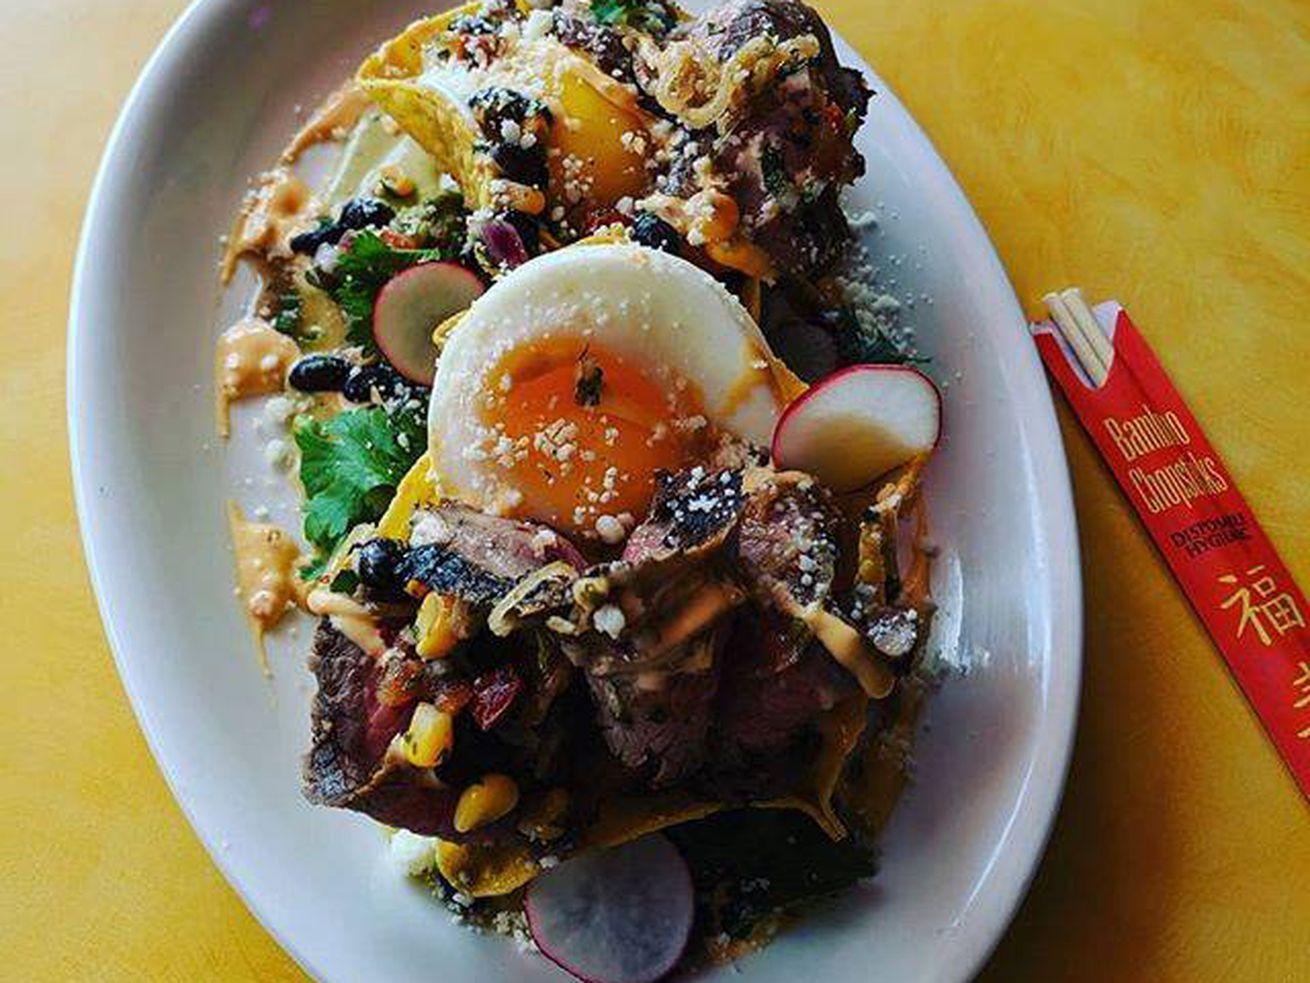 Steak and egg tostada at Dashi